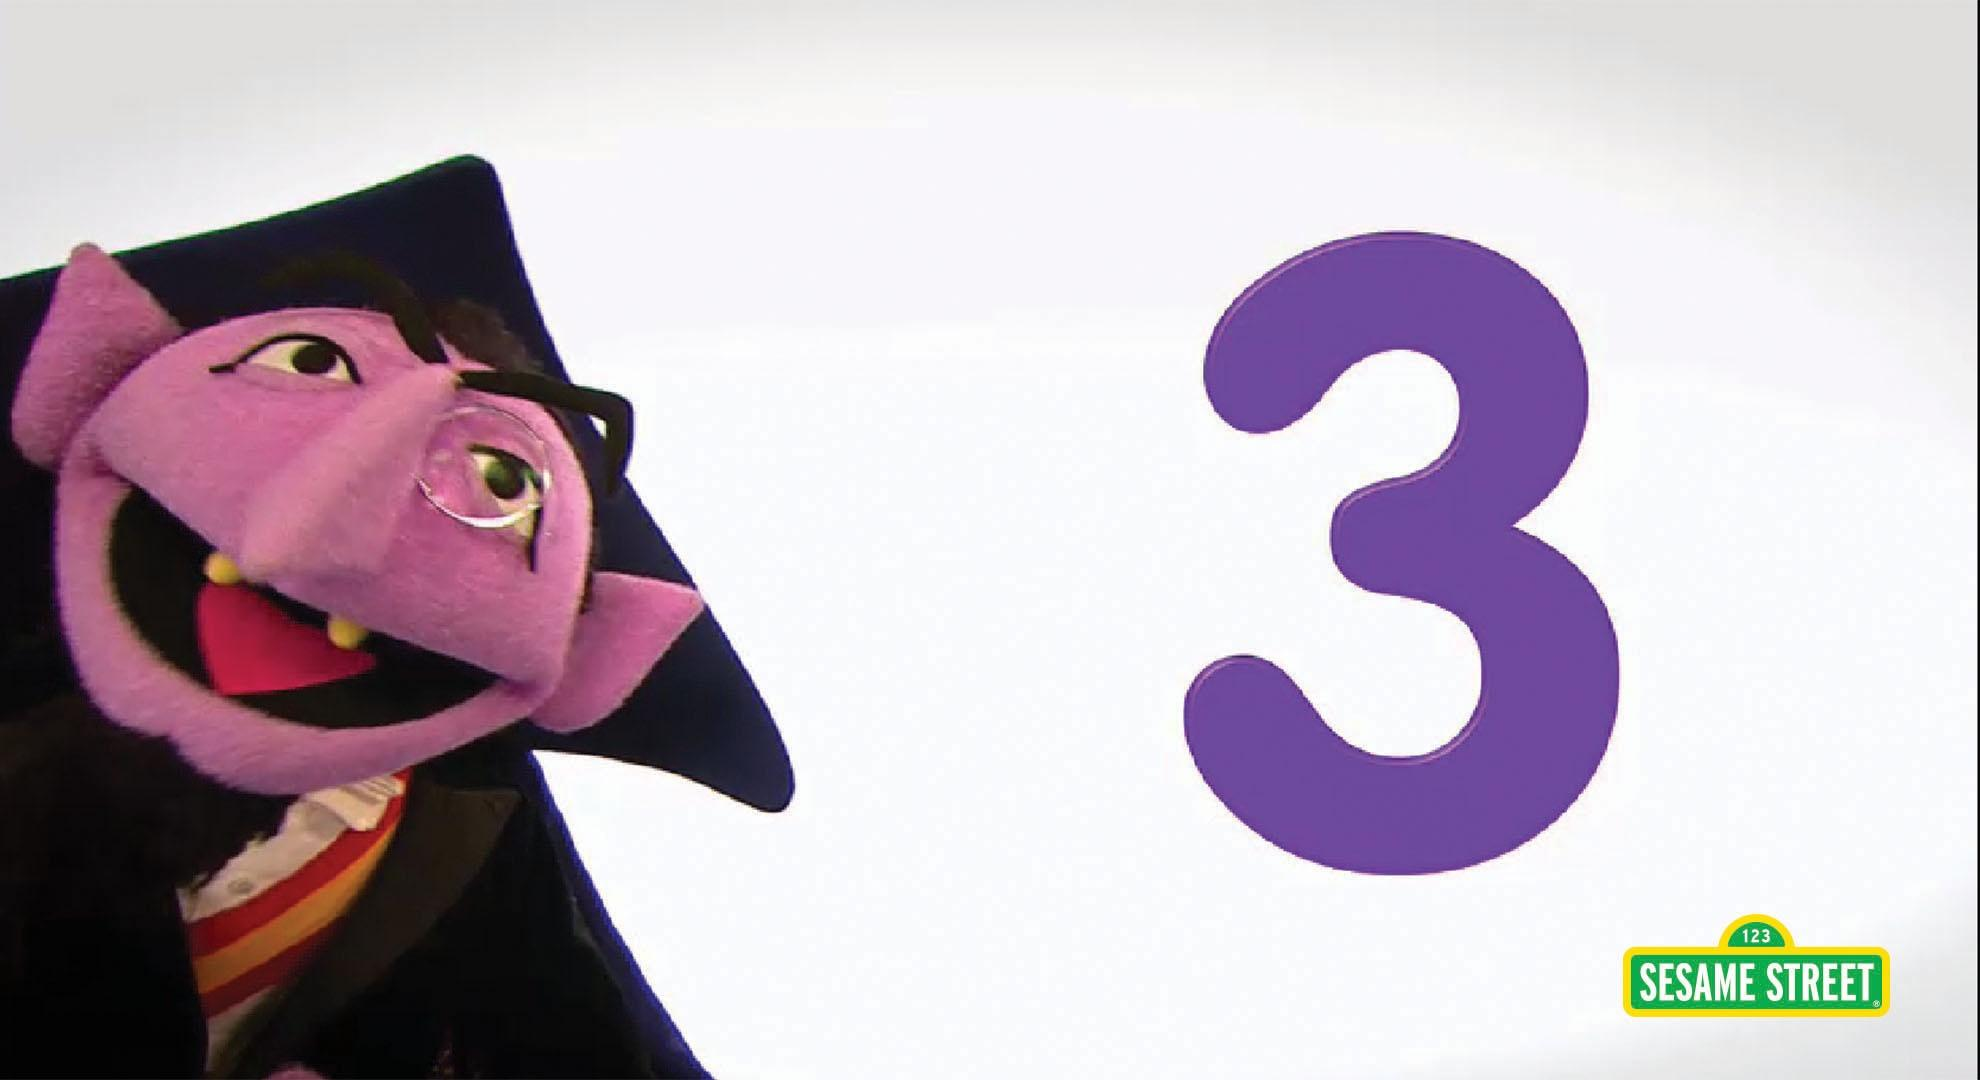 Slider: Relationships Sponsored By The Number 3